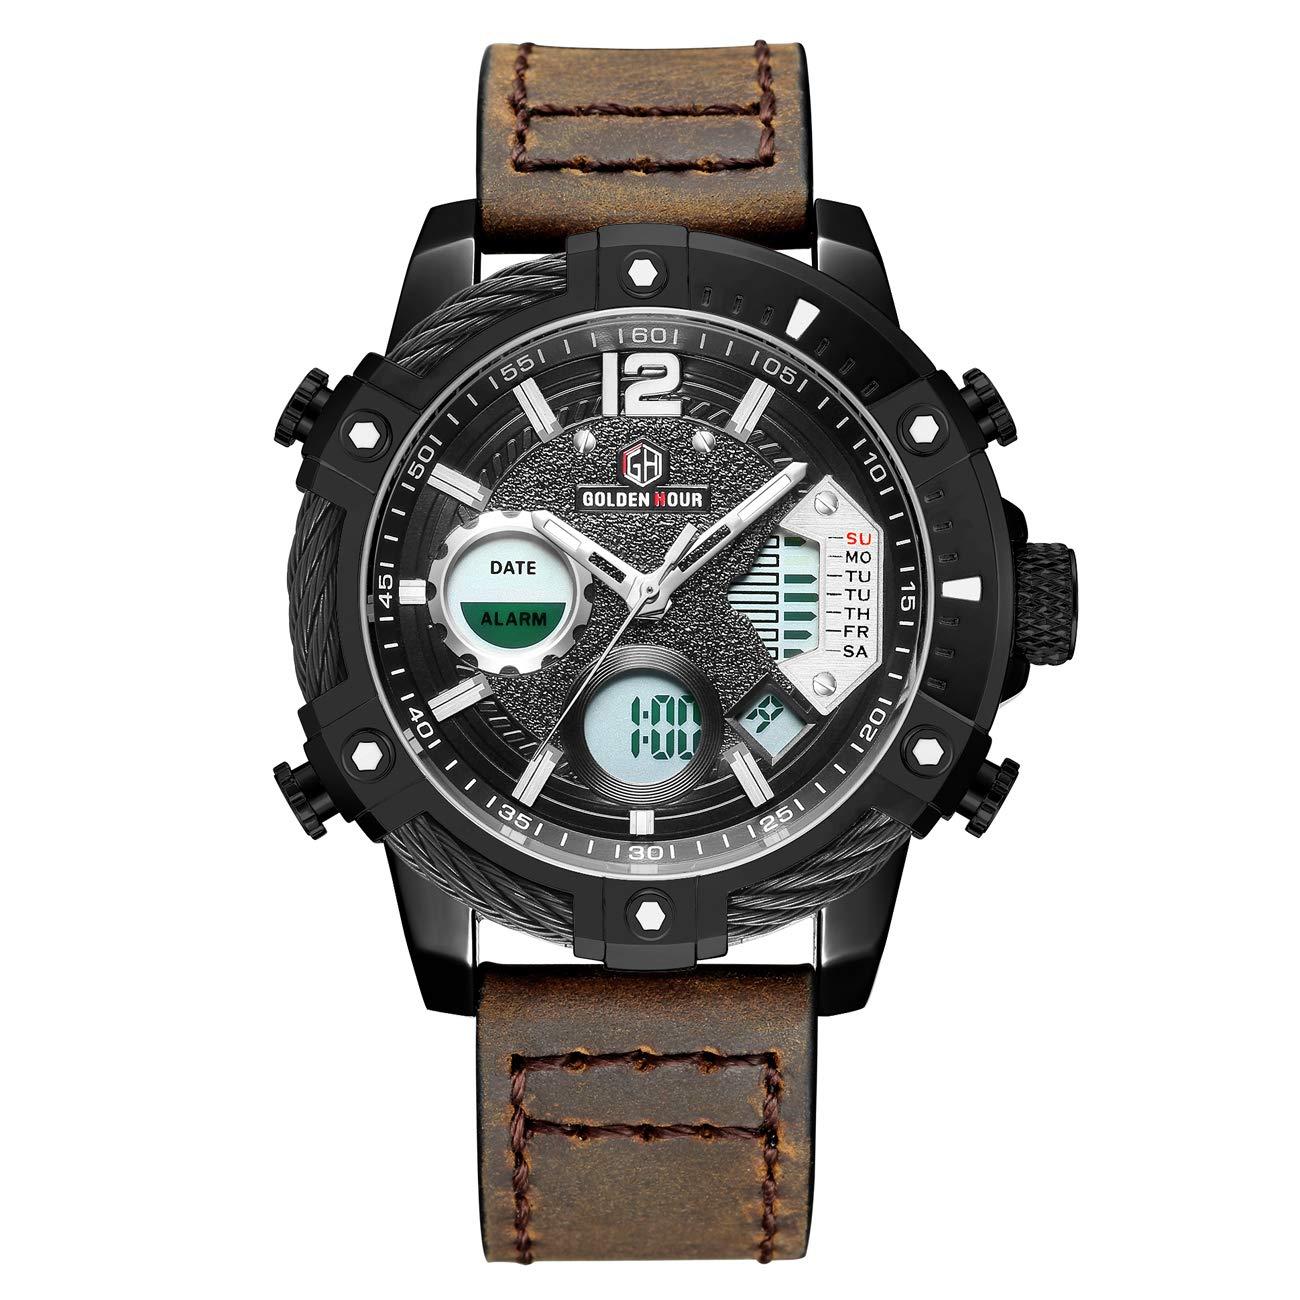 Relojes de Cuarzo Analš®gicos Digitales Deporte para Hombre para Hombres cronš®grafo Militar Reloj Impermeable (Deep Brown-120): Amazon.es: Relojes